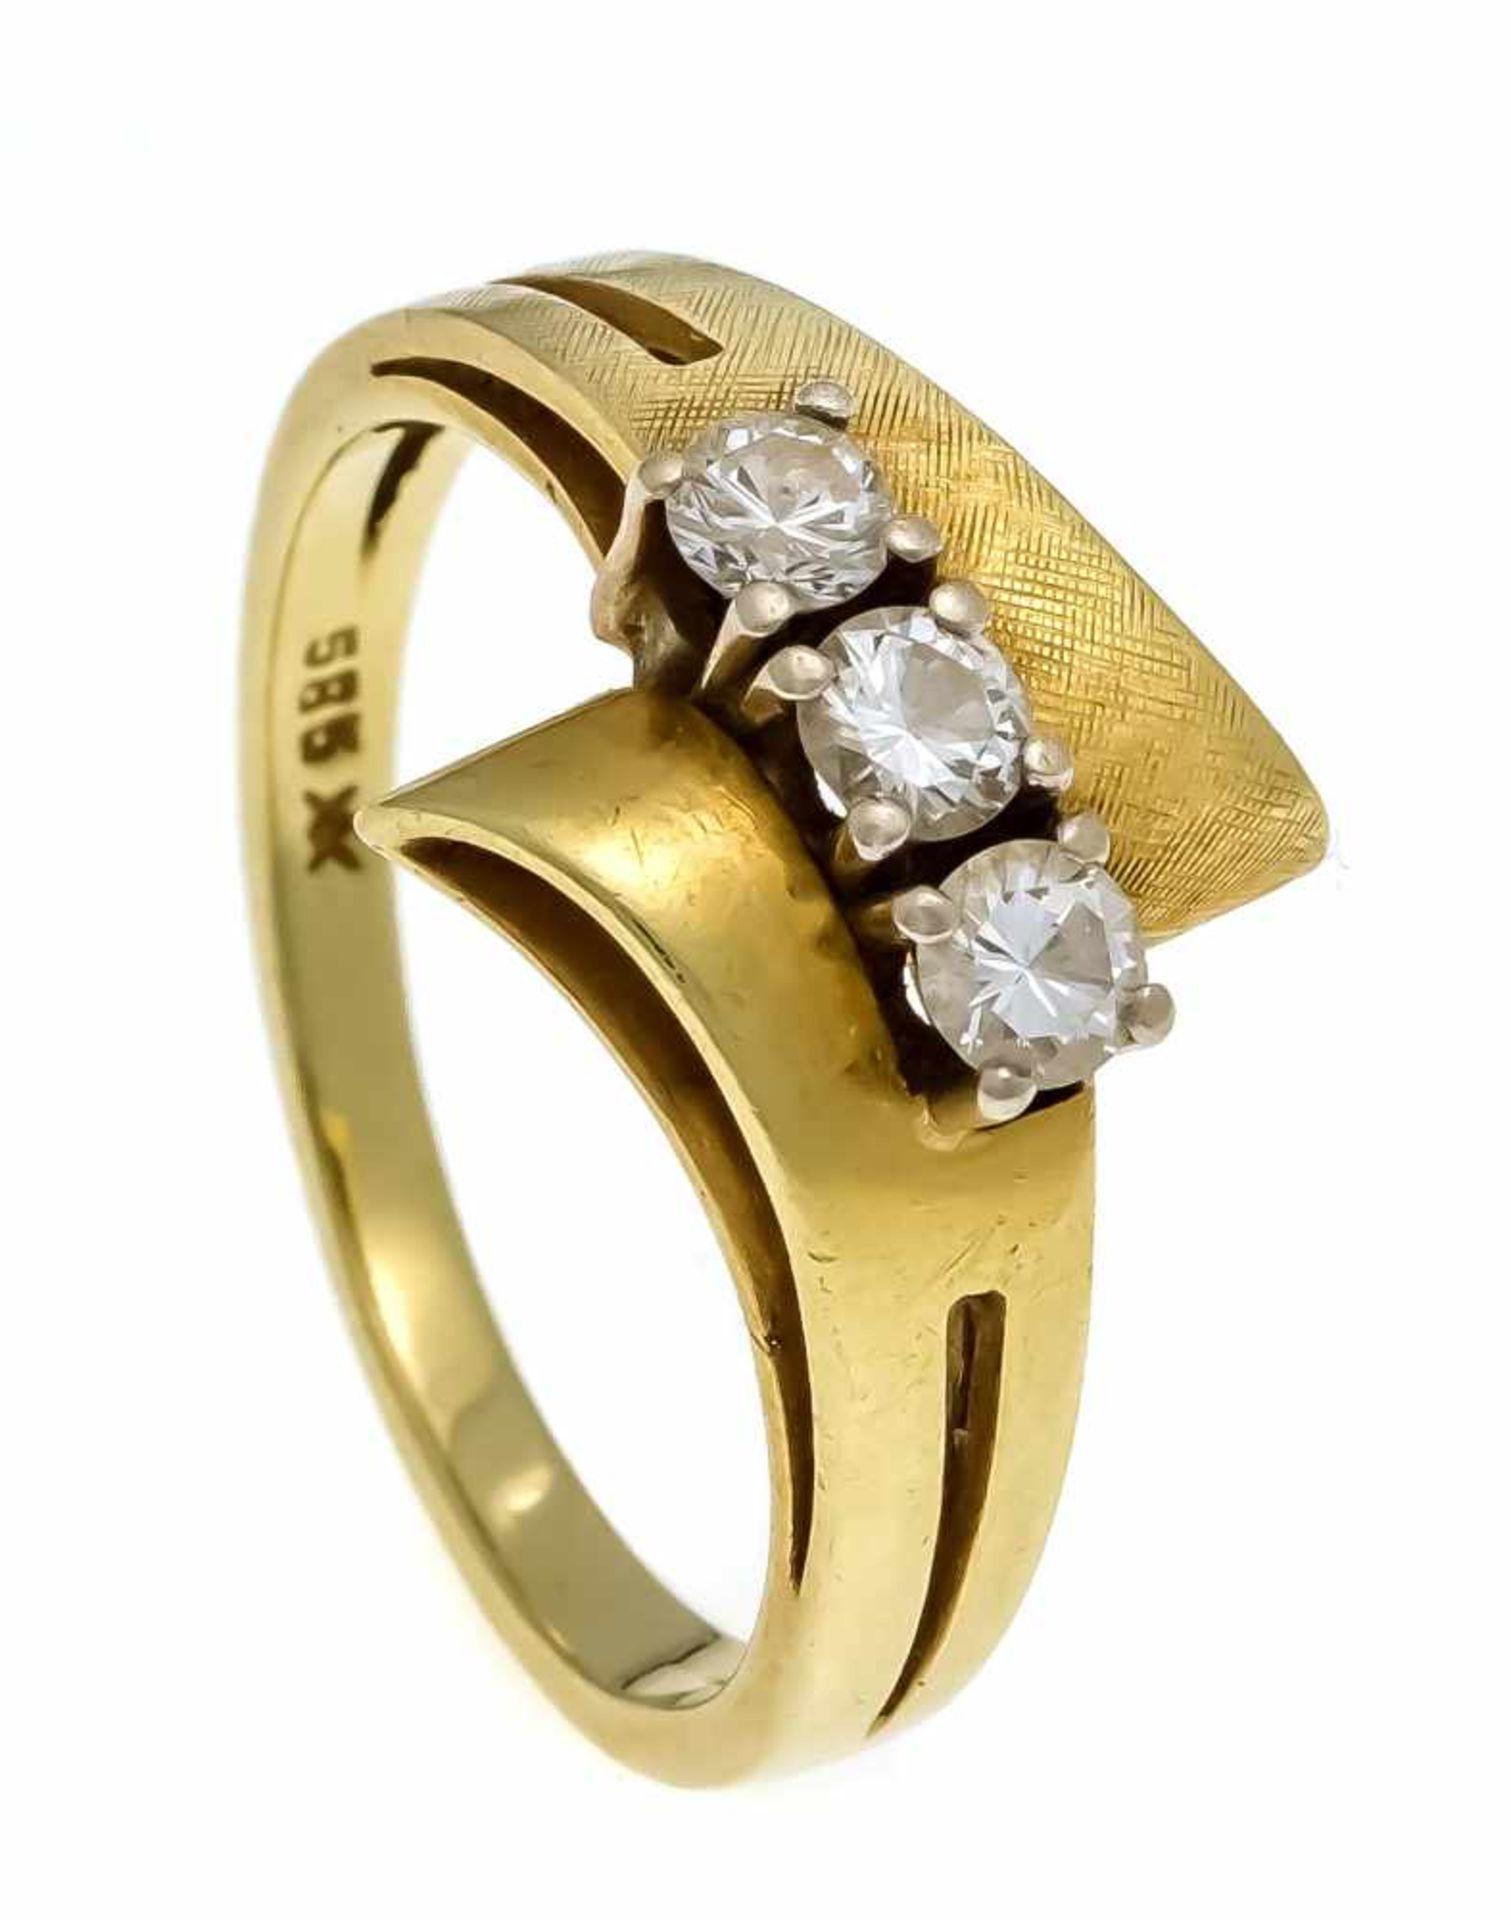 Brillant-Ring GG/WG 585/000 mit 3 Brillanten, zus. 0,42 ct l.get.W/VS, RG 55, 4,0 gDiamond ring GG /